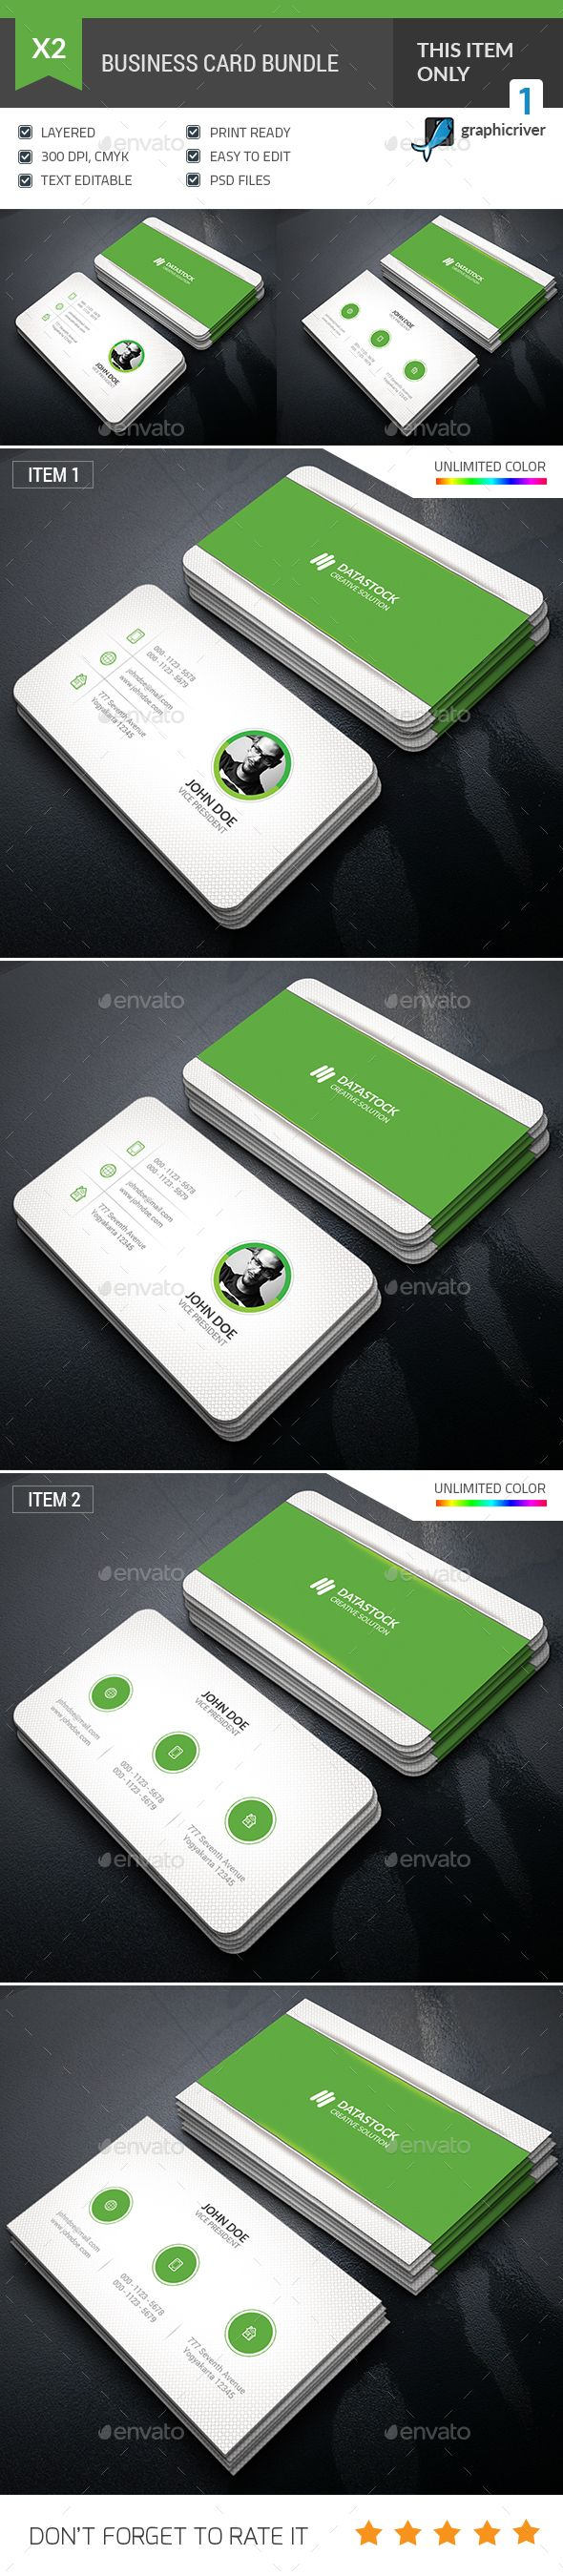 Business Card Bundle Templates PSD. Download here: https://graphicriver.net/item/business-card-bundle/17105505?ref=ksioks